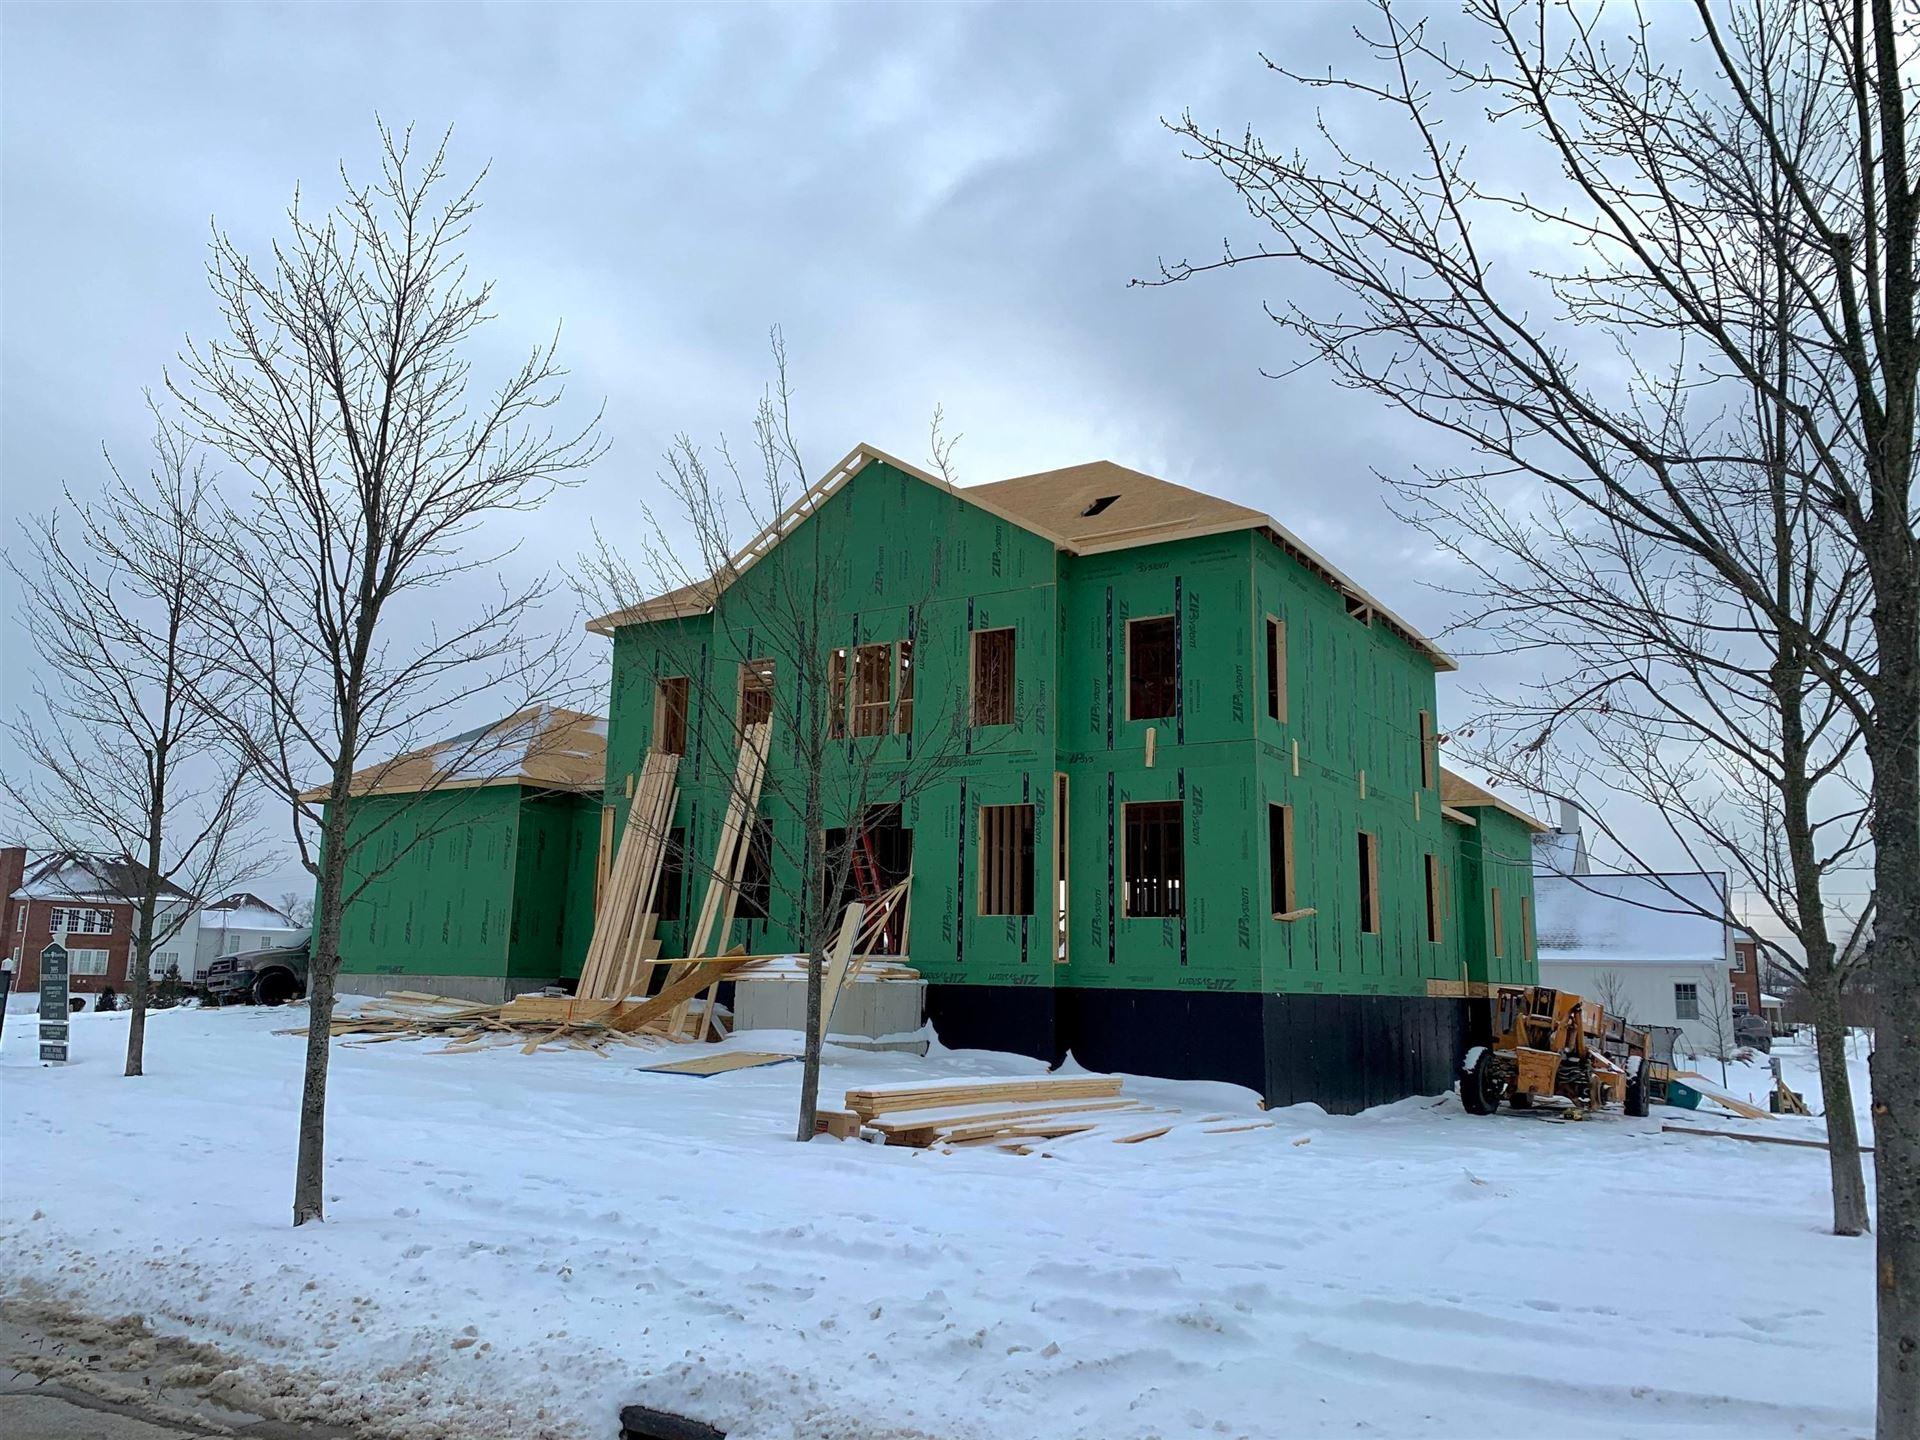 Lot 8 Ebrington Rd, New Albany, OH 43054 - MLS#: 221003989